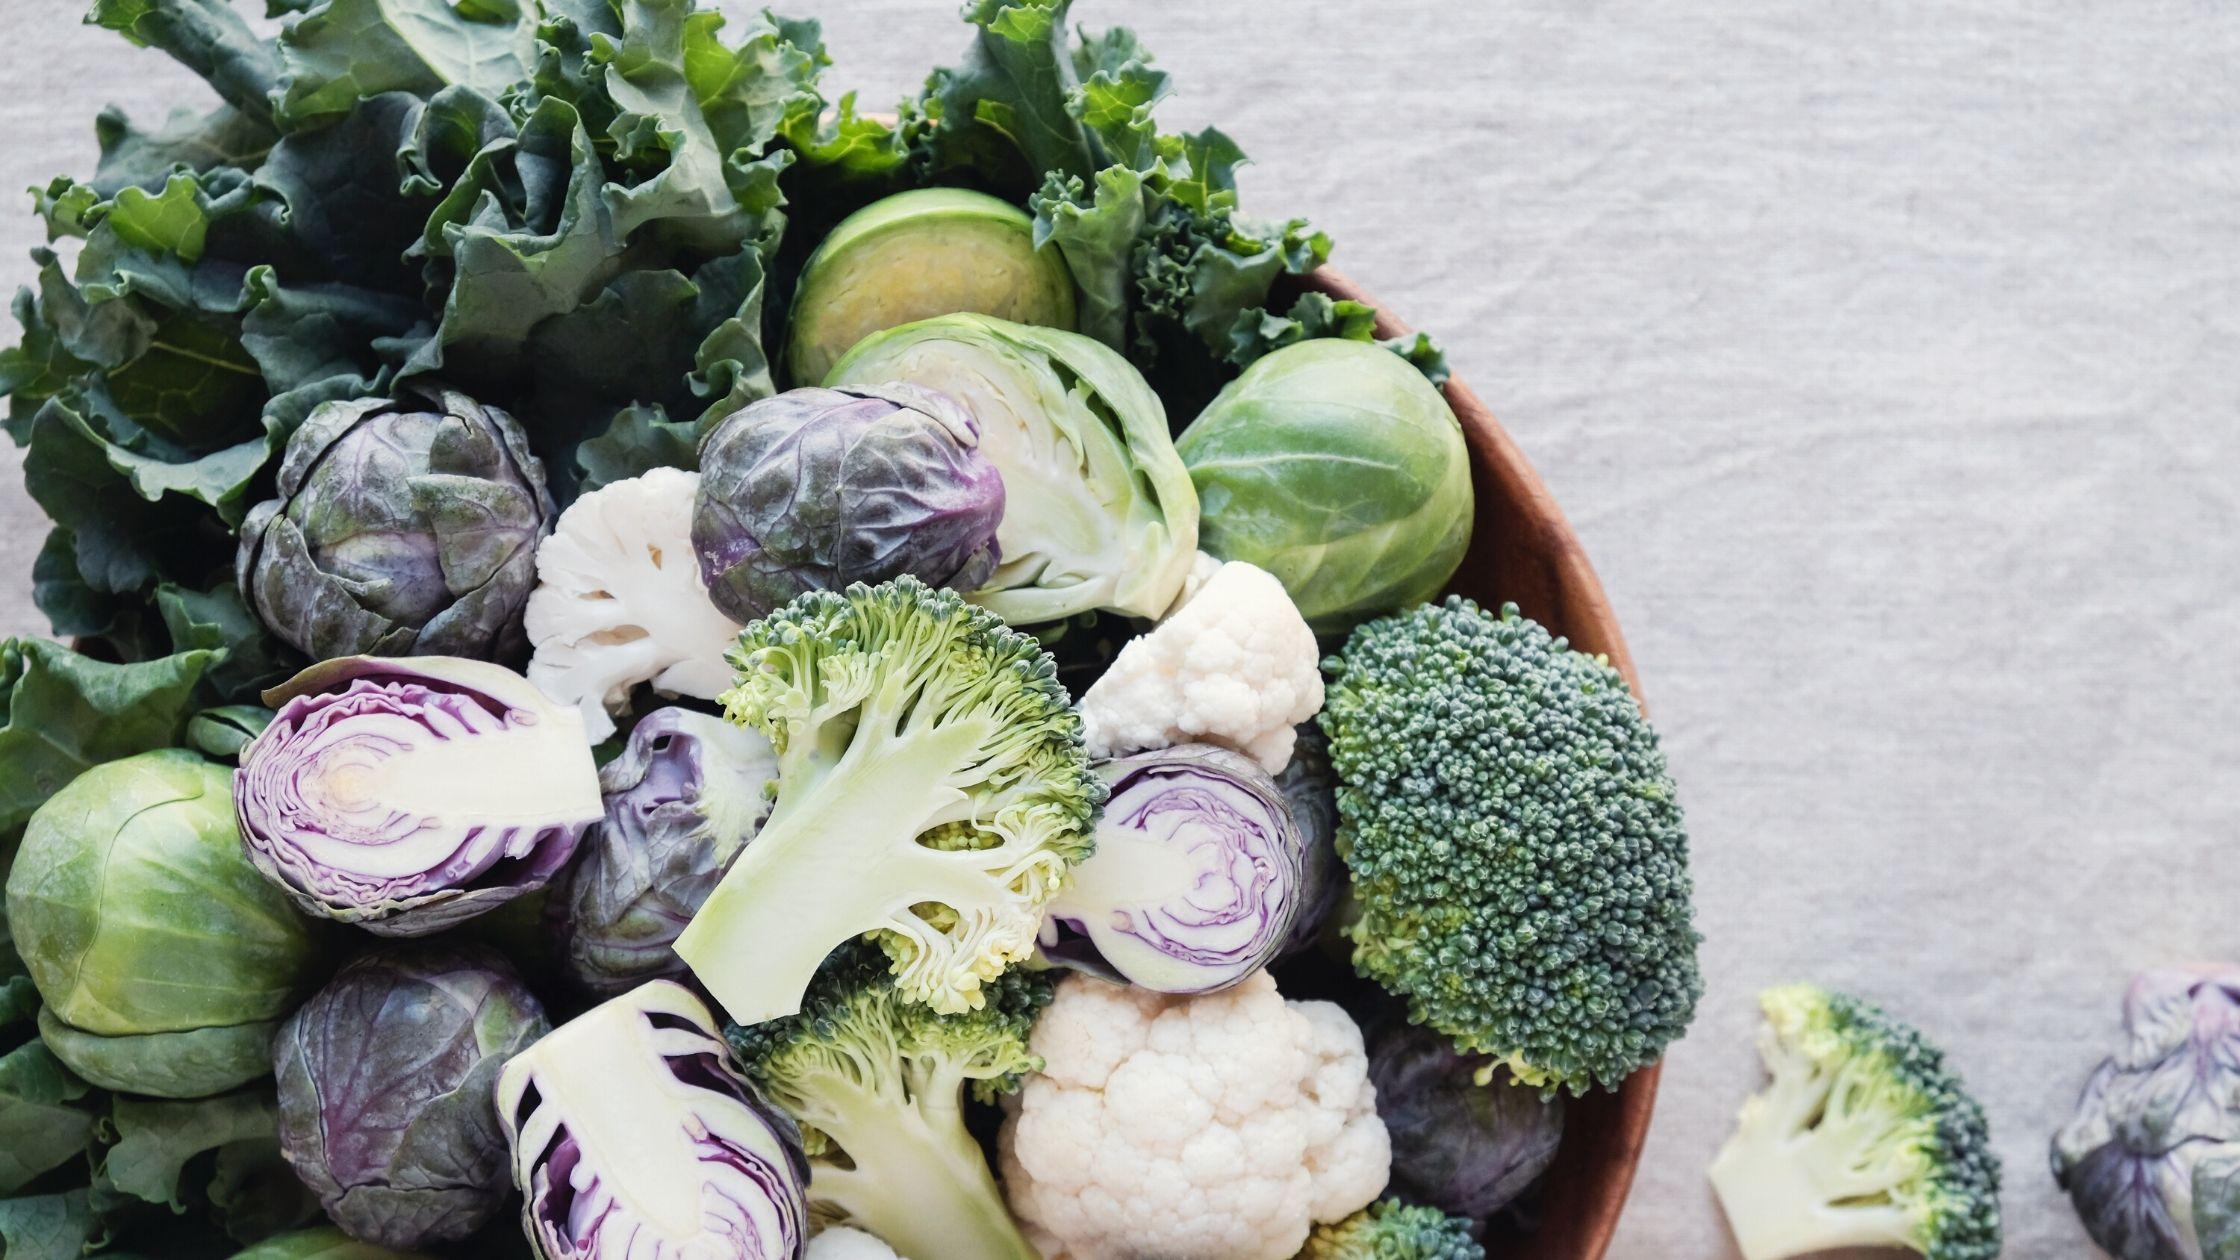 Verdure crucifere: benefici e utilizzi